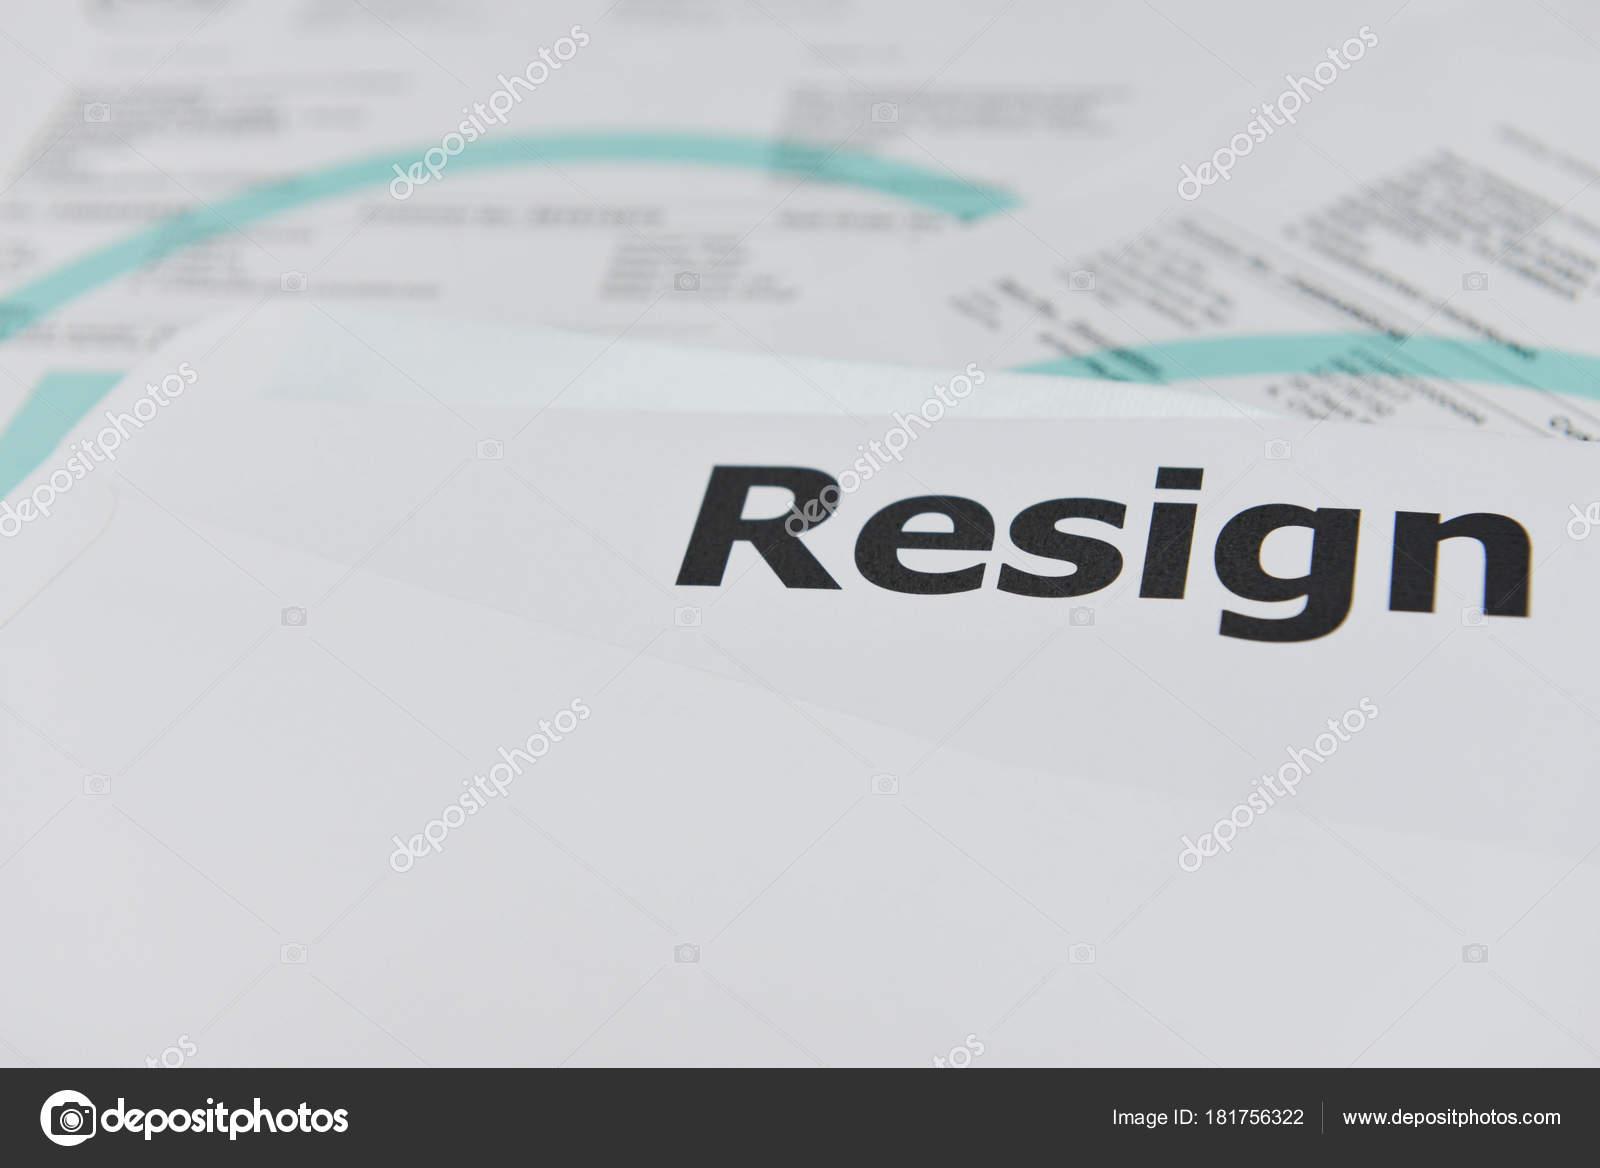 Resignation Letter Envelope — Stock Photo © magneticmcc #181756322